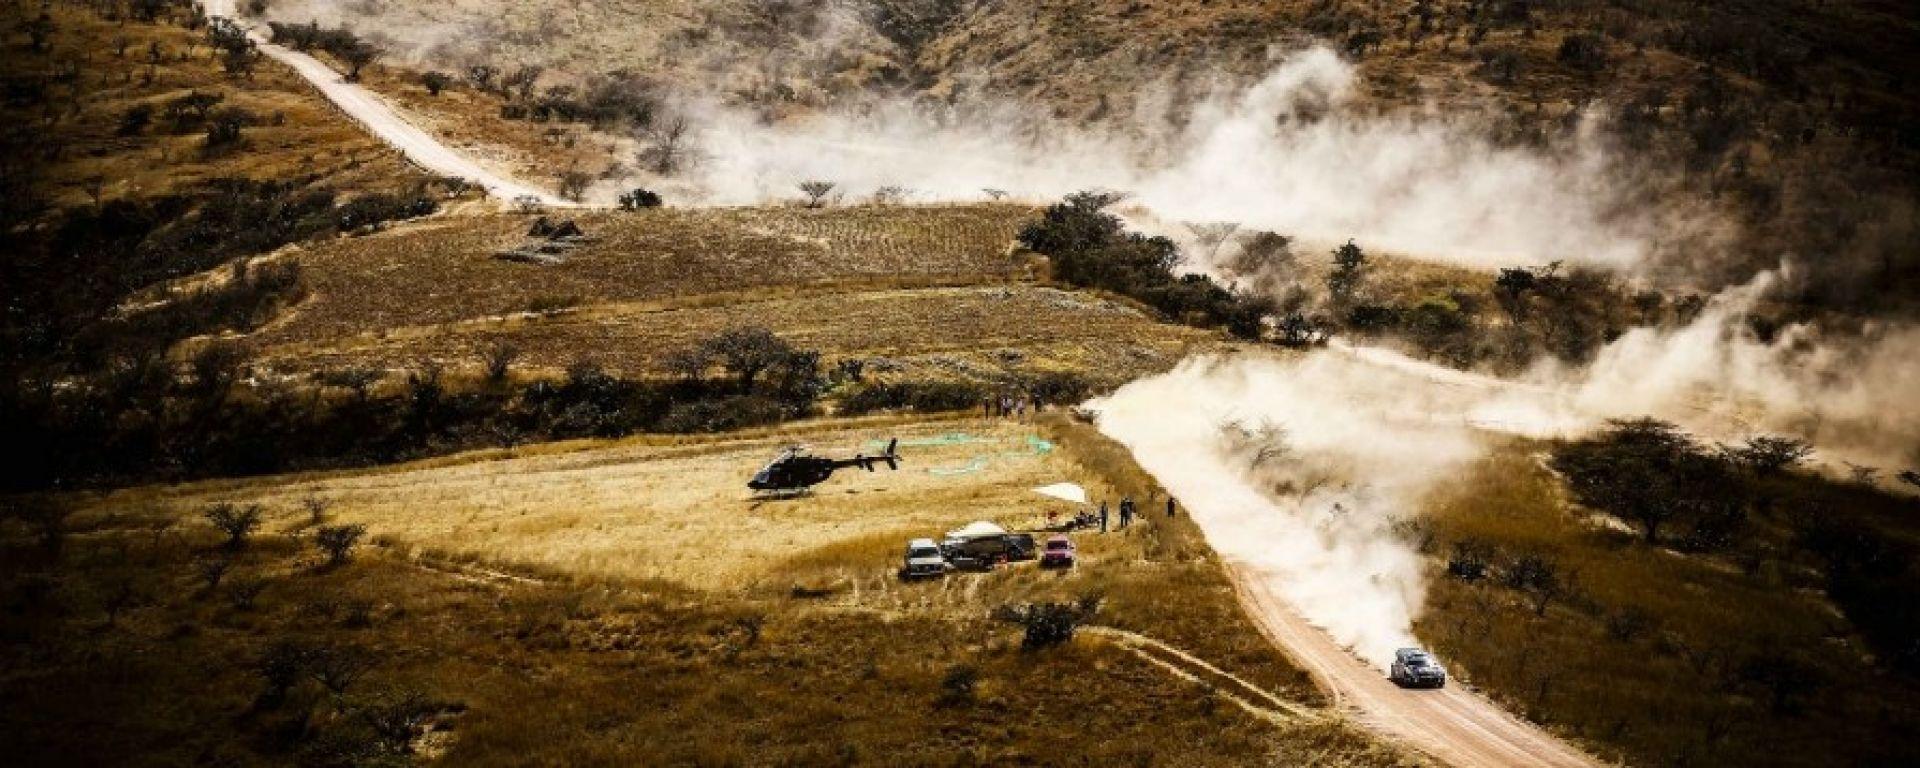 WRC 2017 - Rally del Messico